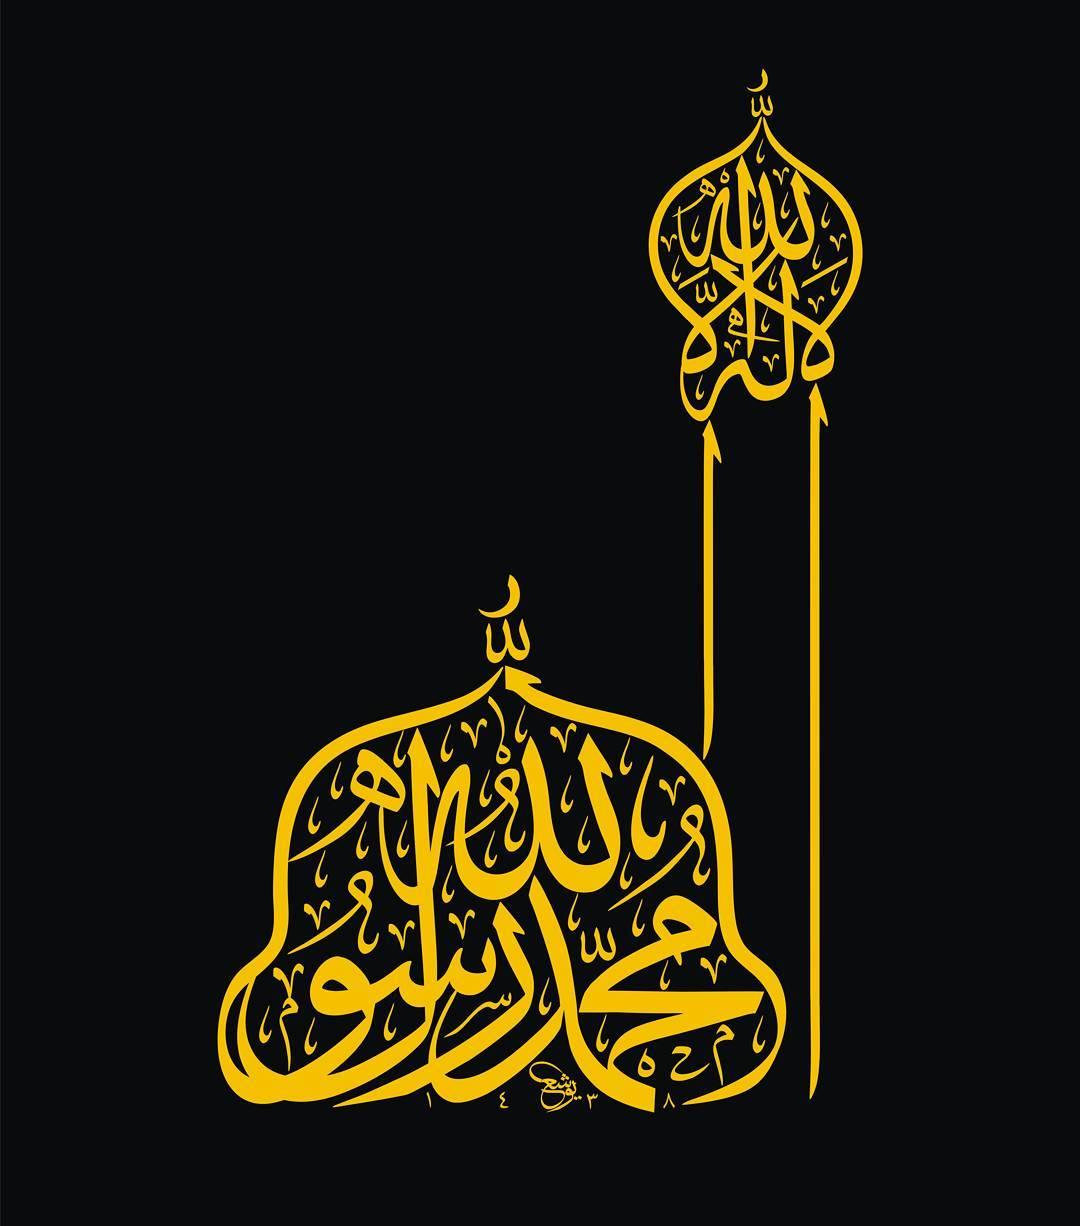 Donwload Photo Khat Unik لا اله الا الله محمد رسول الله  There's no deity of worship except Allah and Muh… – Yushaa Abdullah